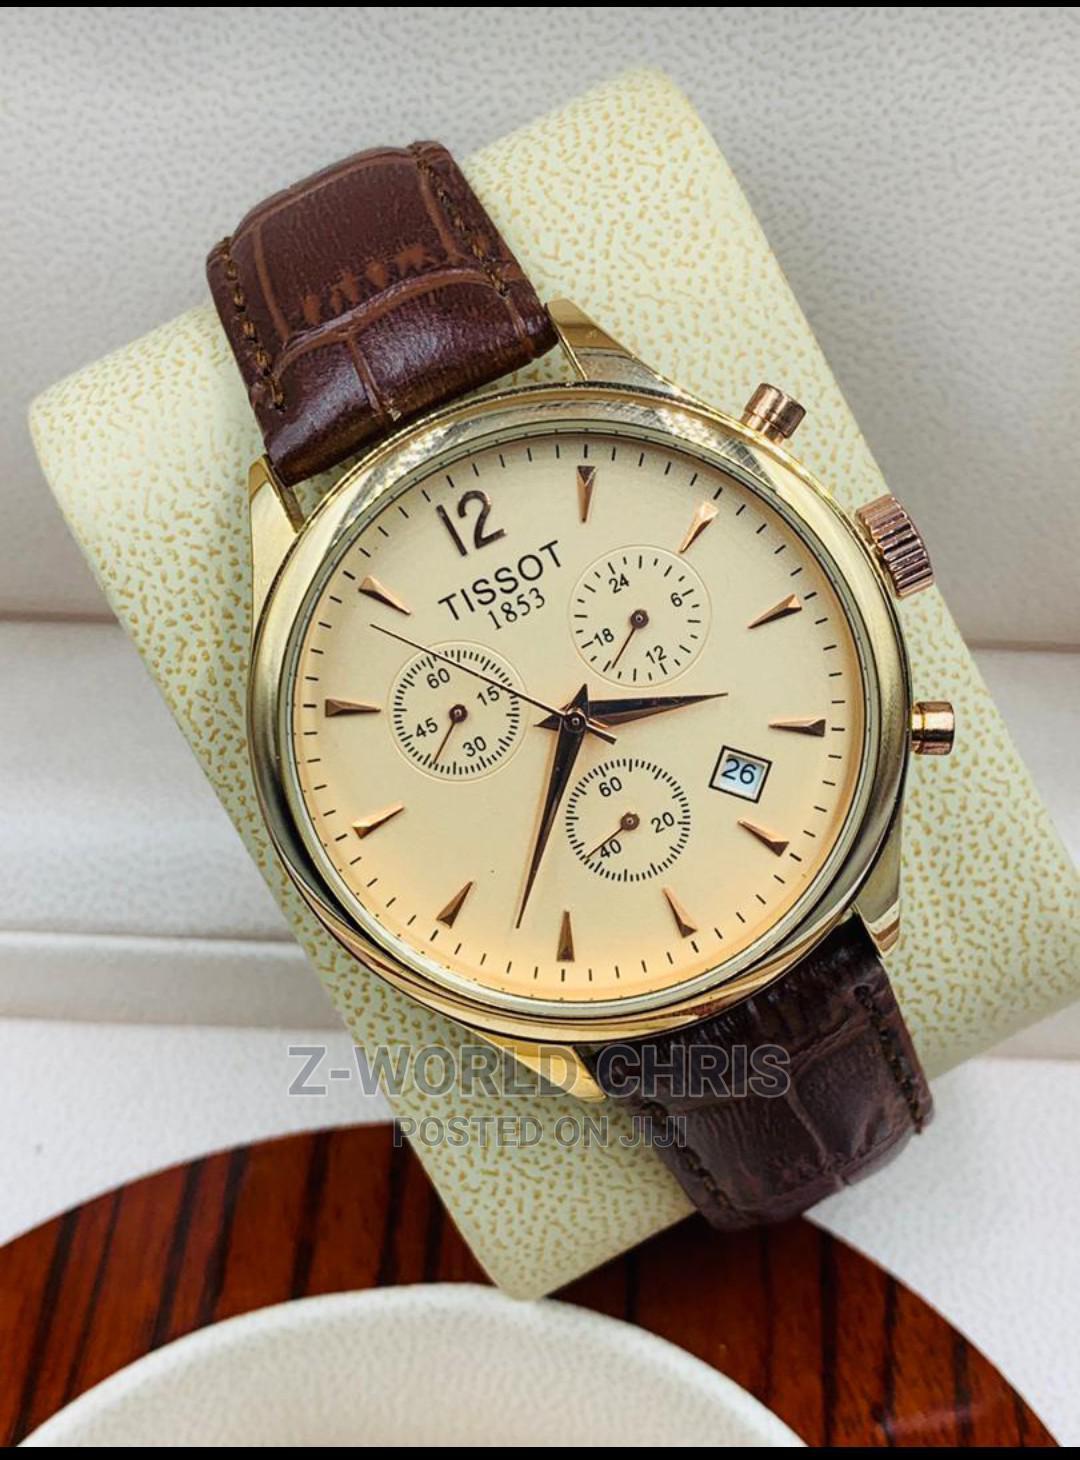 Tissot Men's Brown Leather Wristwatch